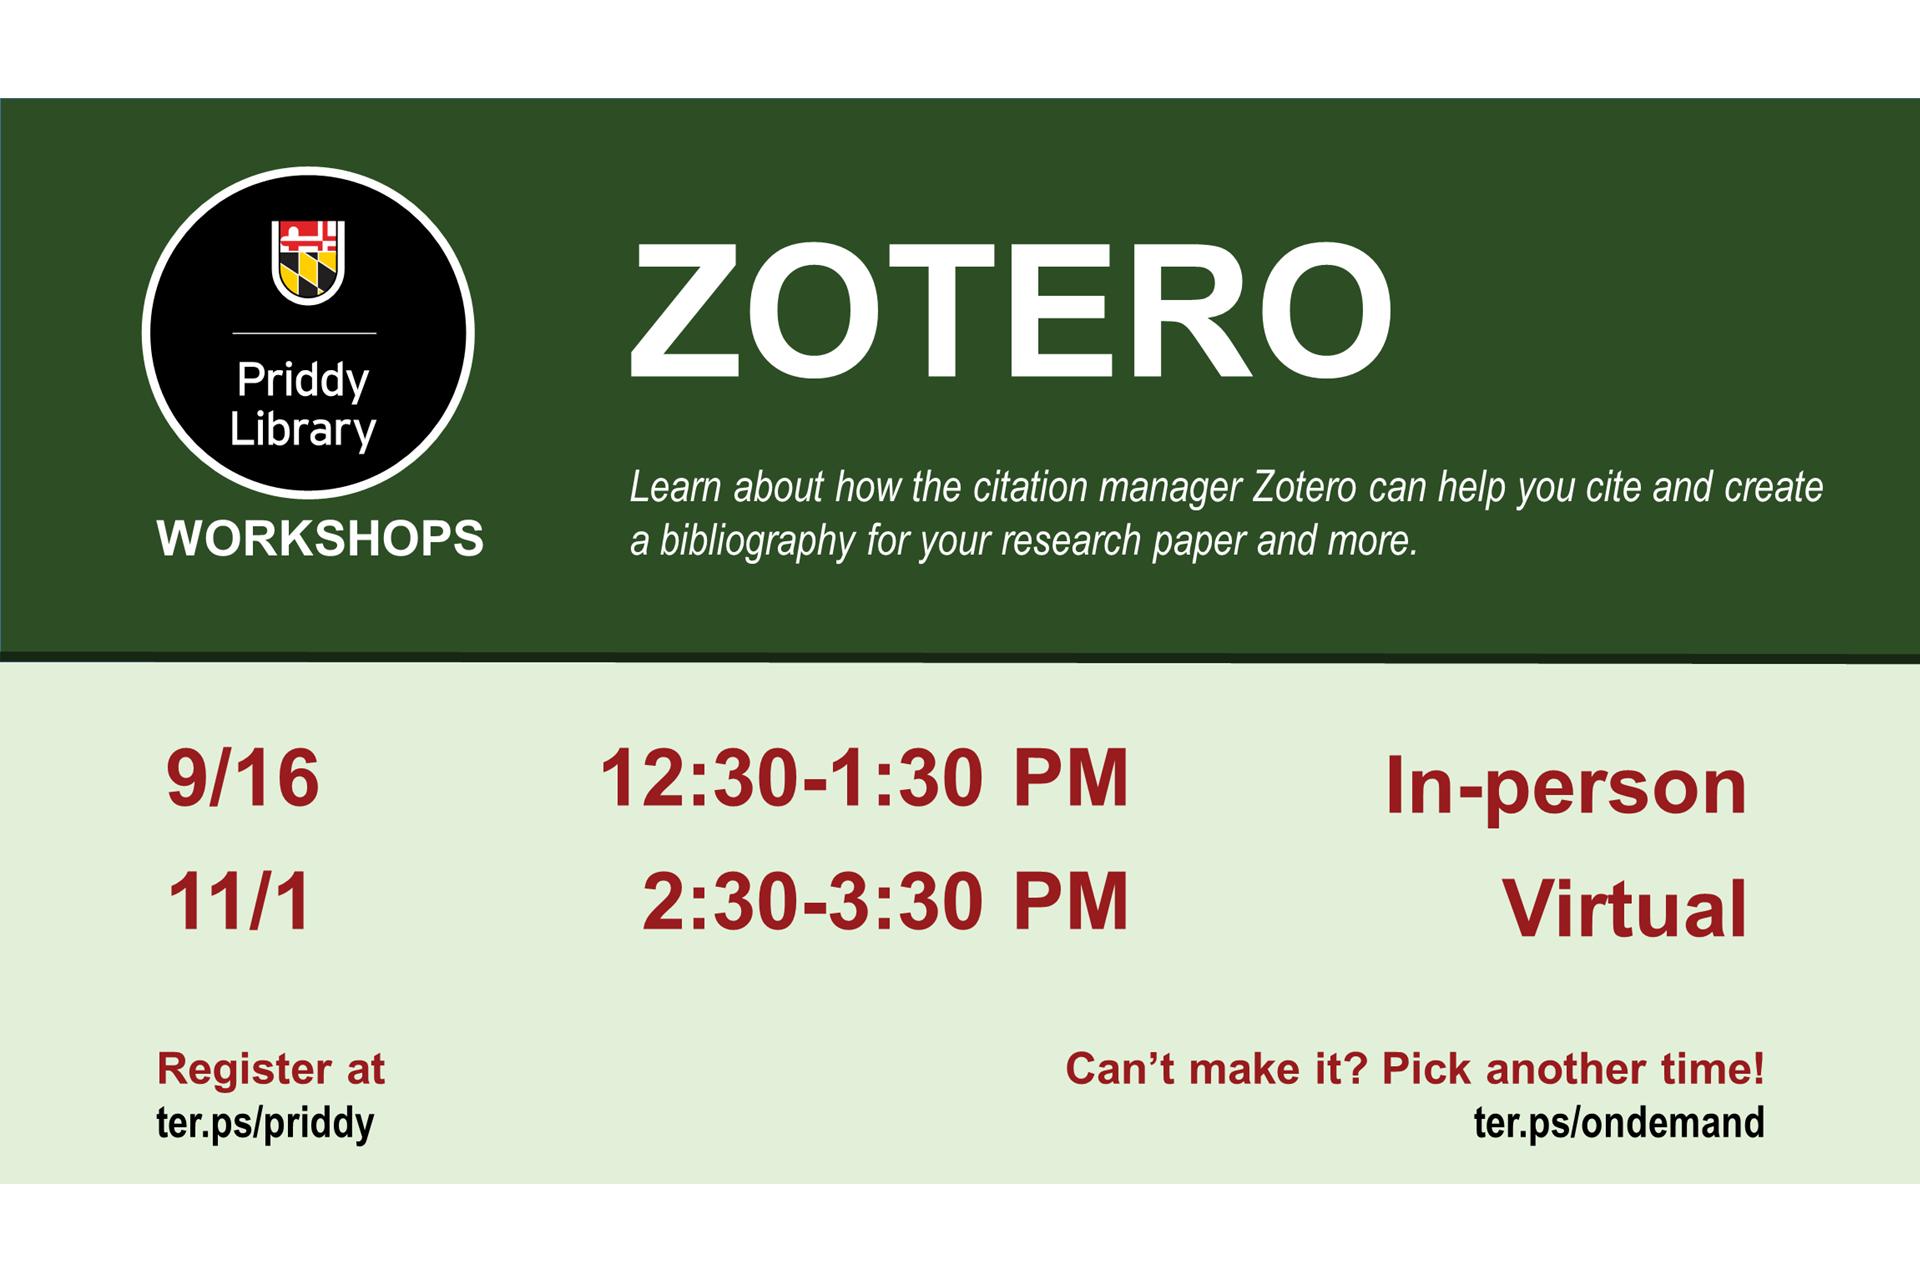 Zotero workshop flyer